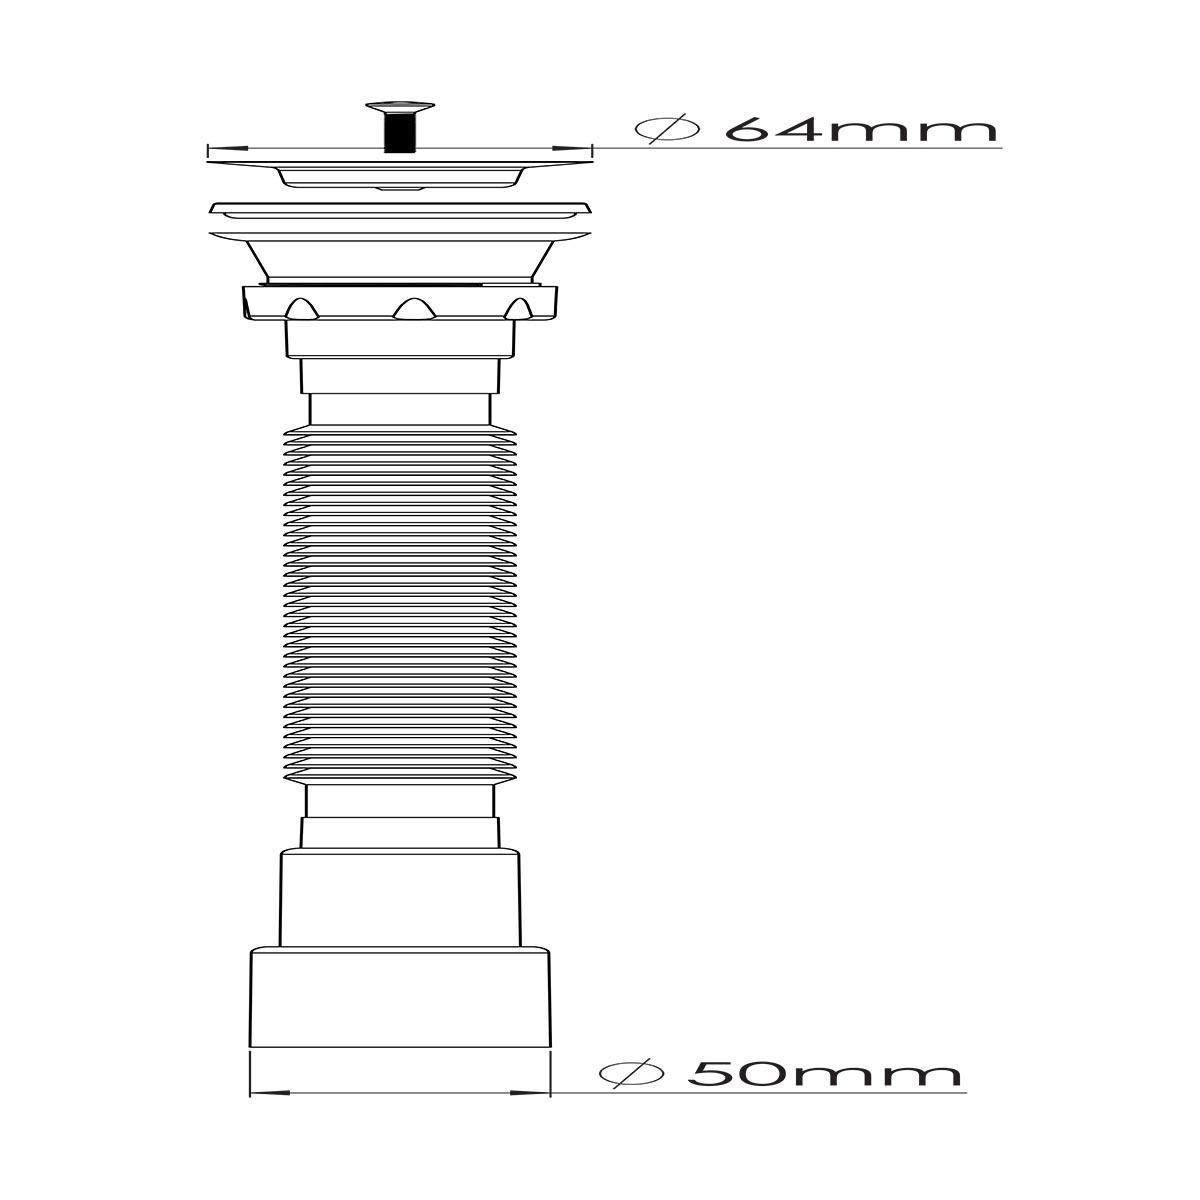 1 ½ – Ø50,  304 Kalite Paslanmaz Vida ve 64 mm Süzgeç